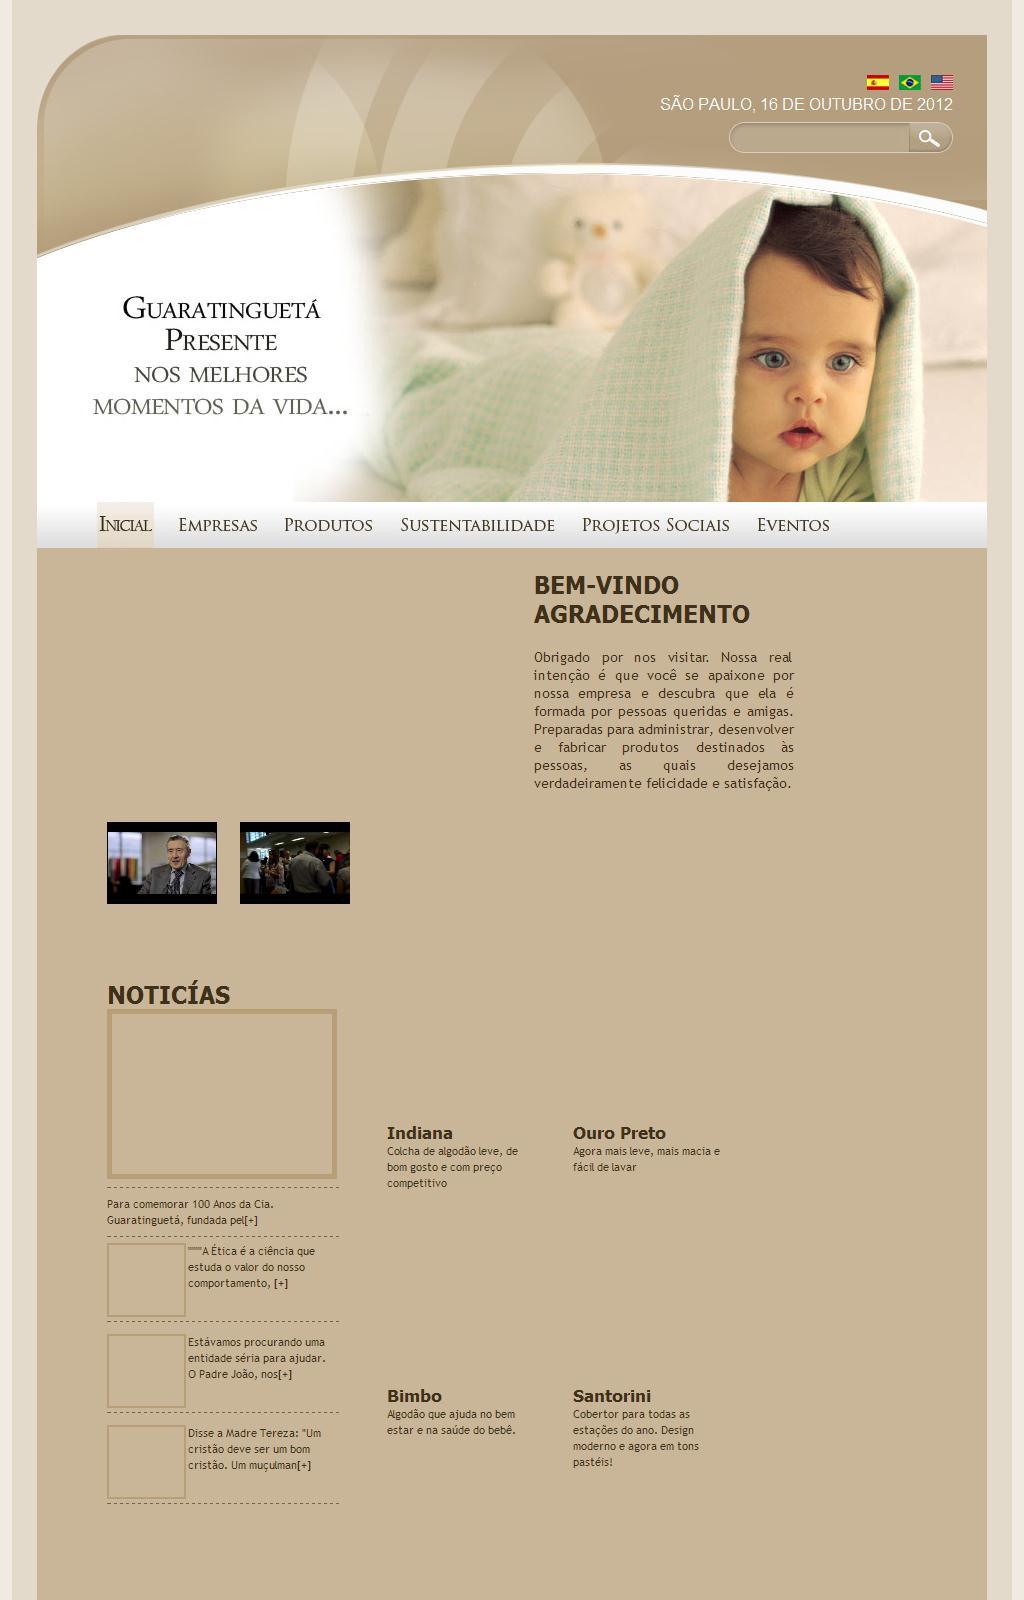 http://www.guaratingueta.com.br/